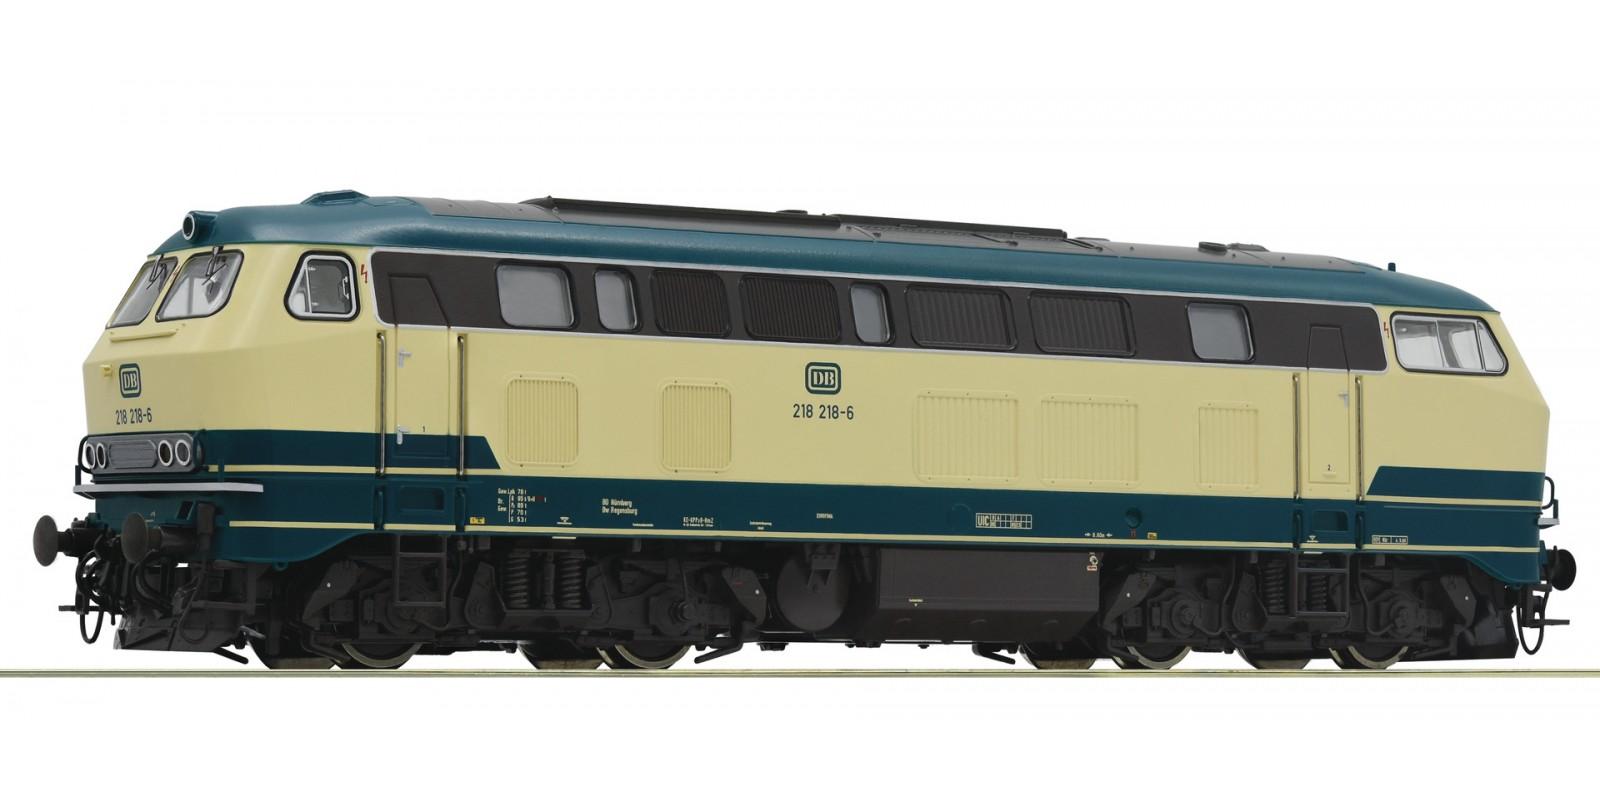 RO73727 Diesel BR 218 oz-bl Snd.